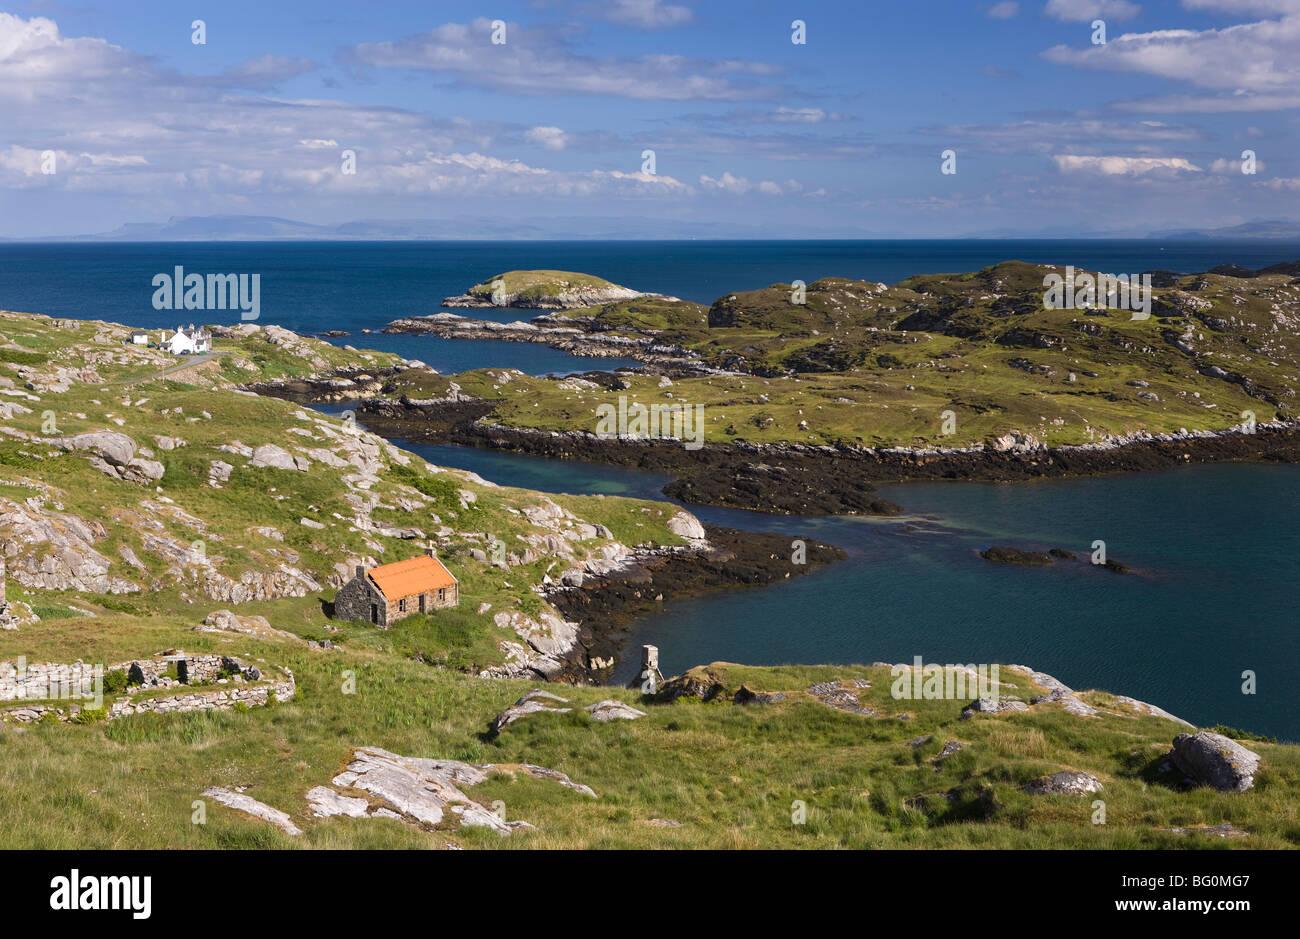 Deserted crofts at township of Manish, Isle of Harris, Outer Hebrides, Scotland, United Kingdom, Europe - Stock Image